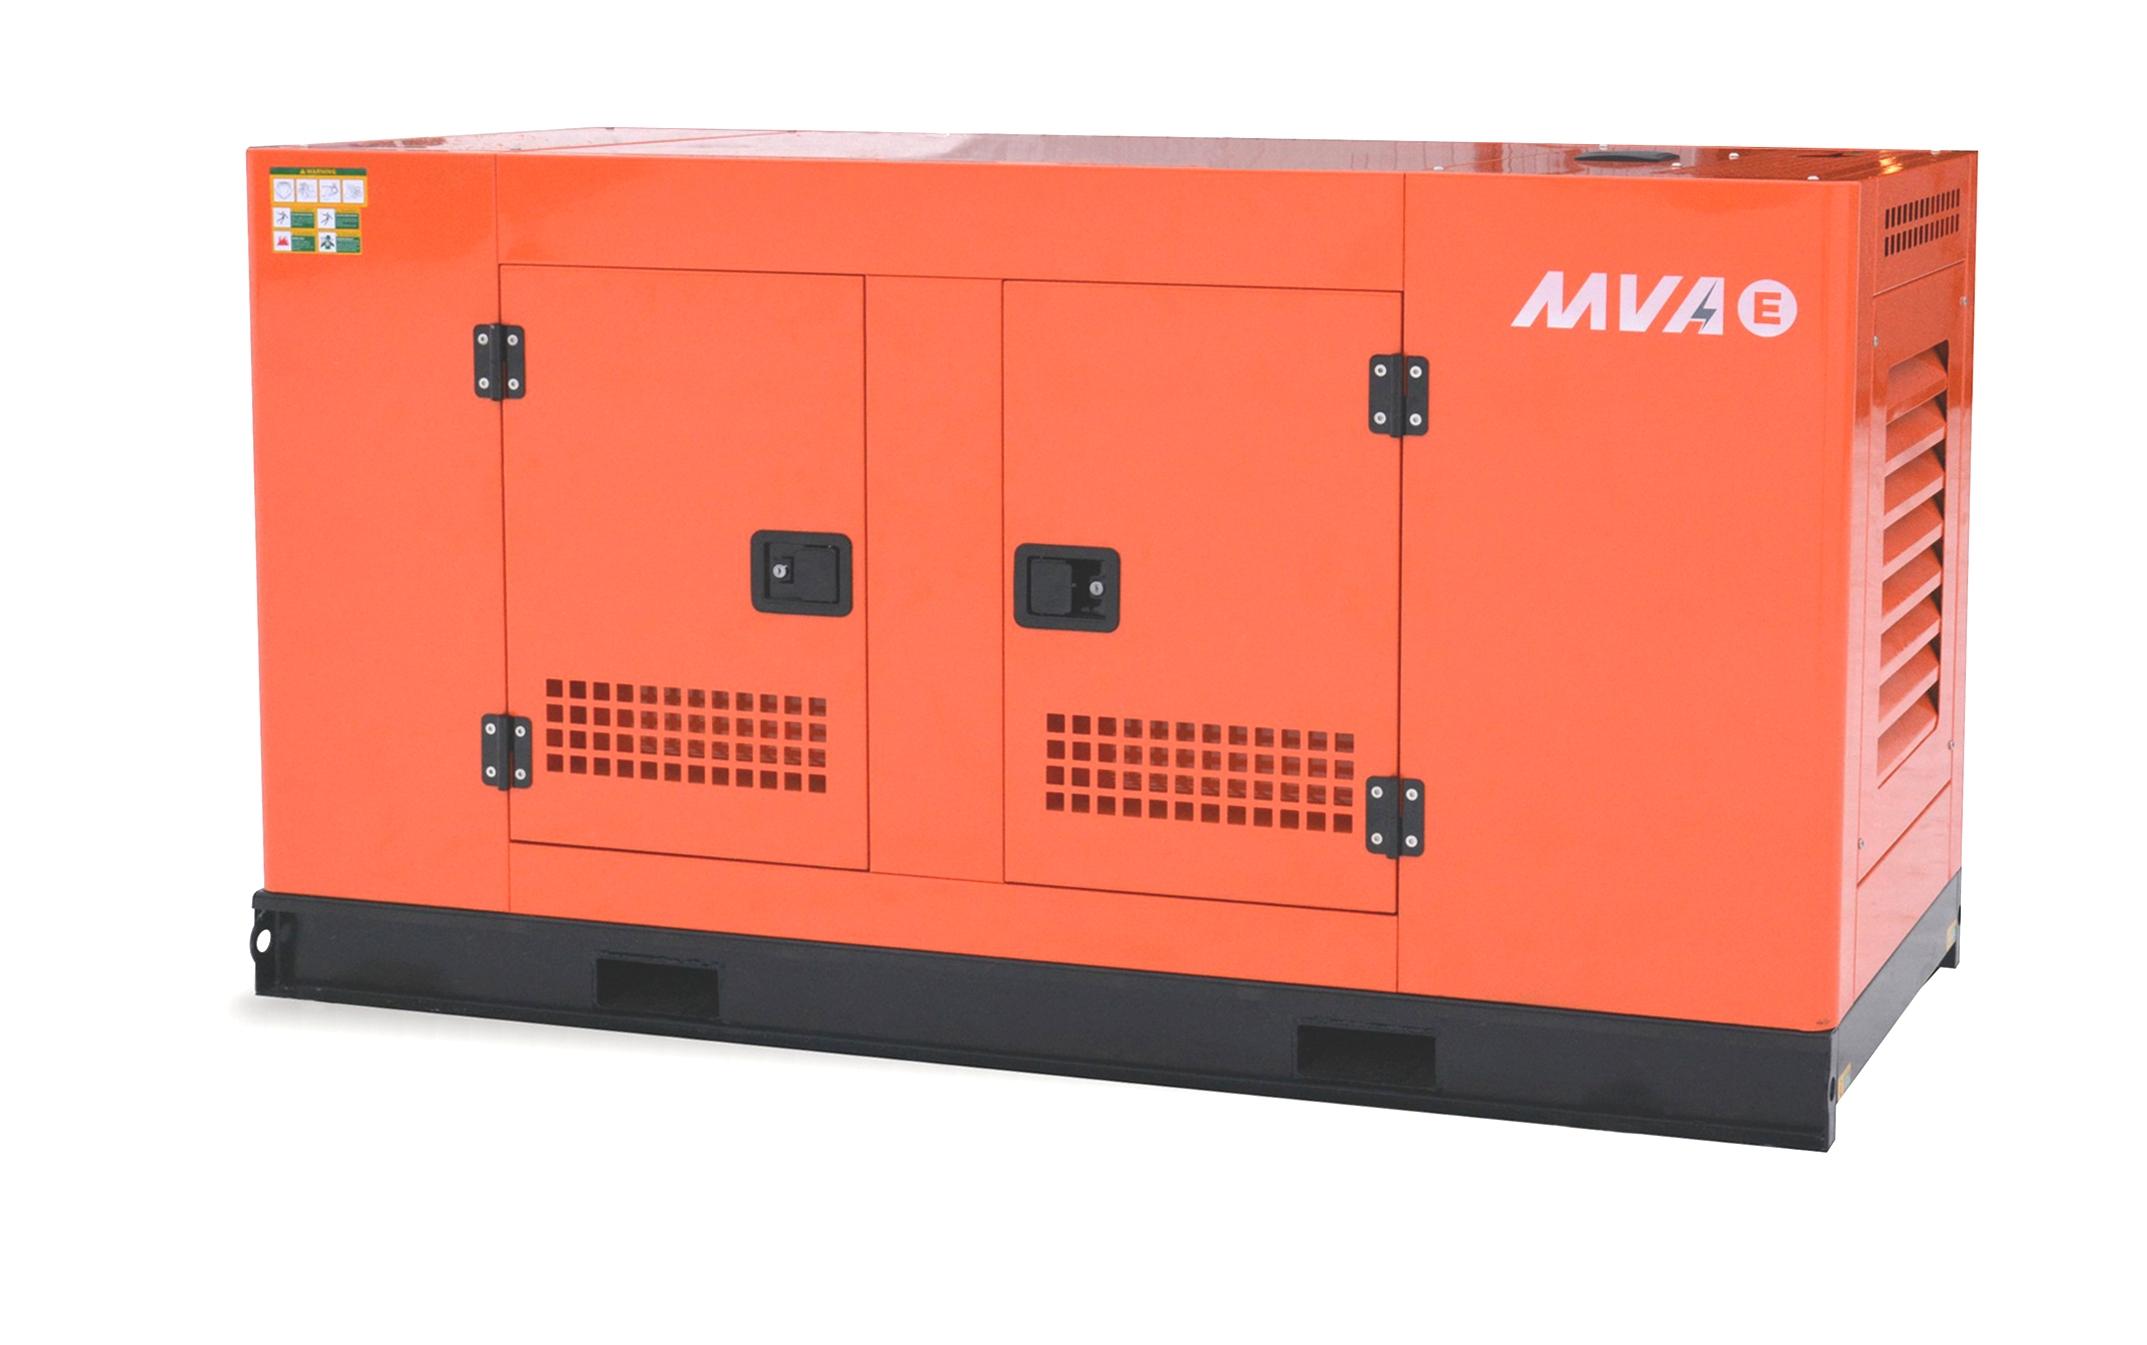 Внешний вид MVAE АД-50-400-АРК в кожухе с АВР